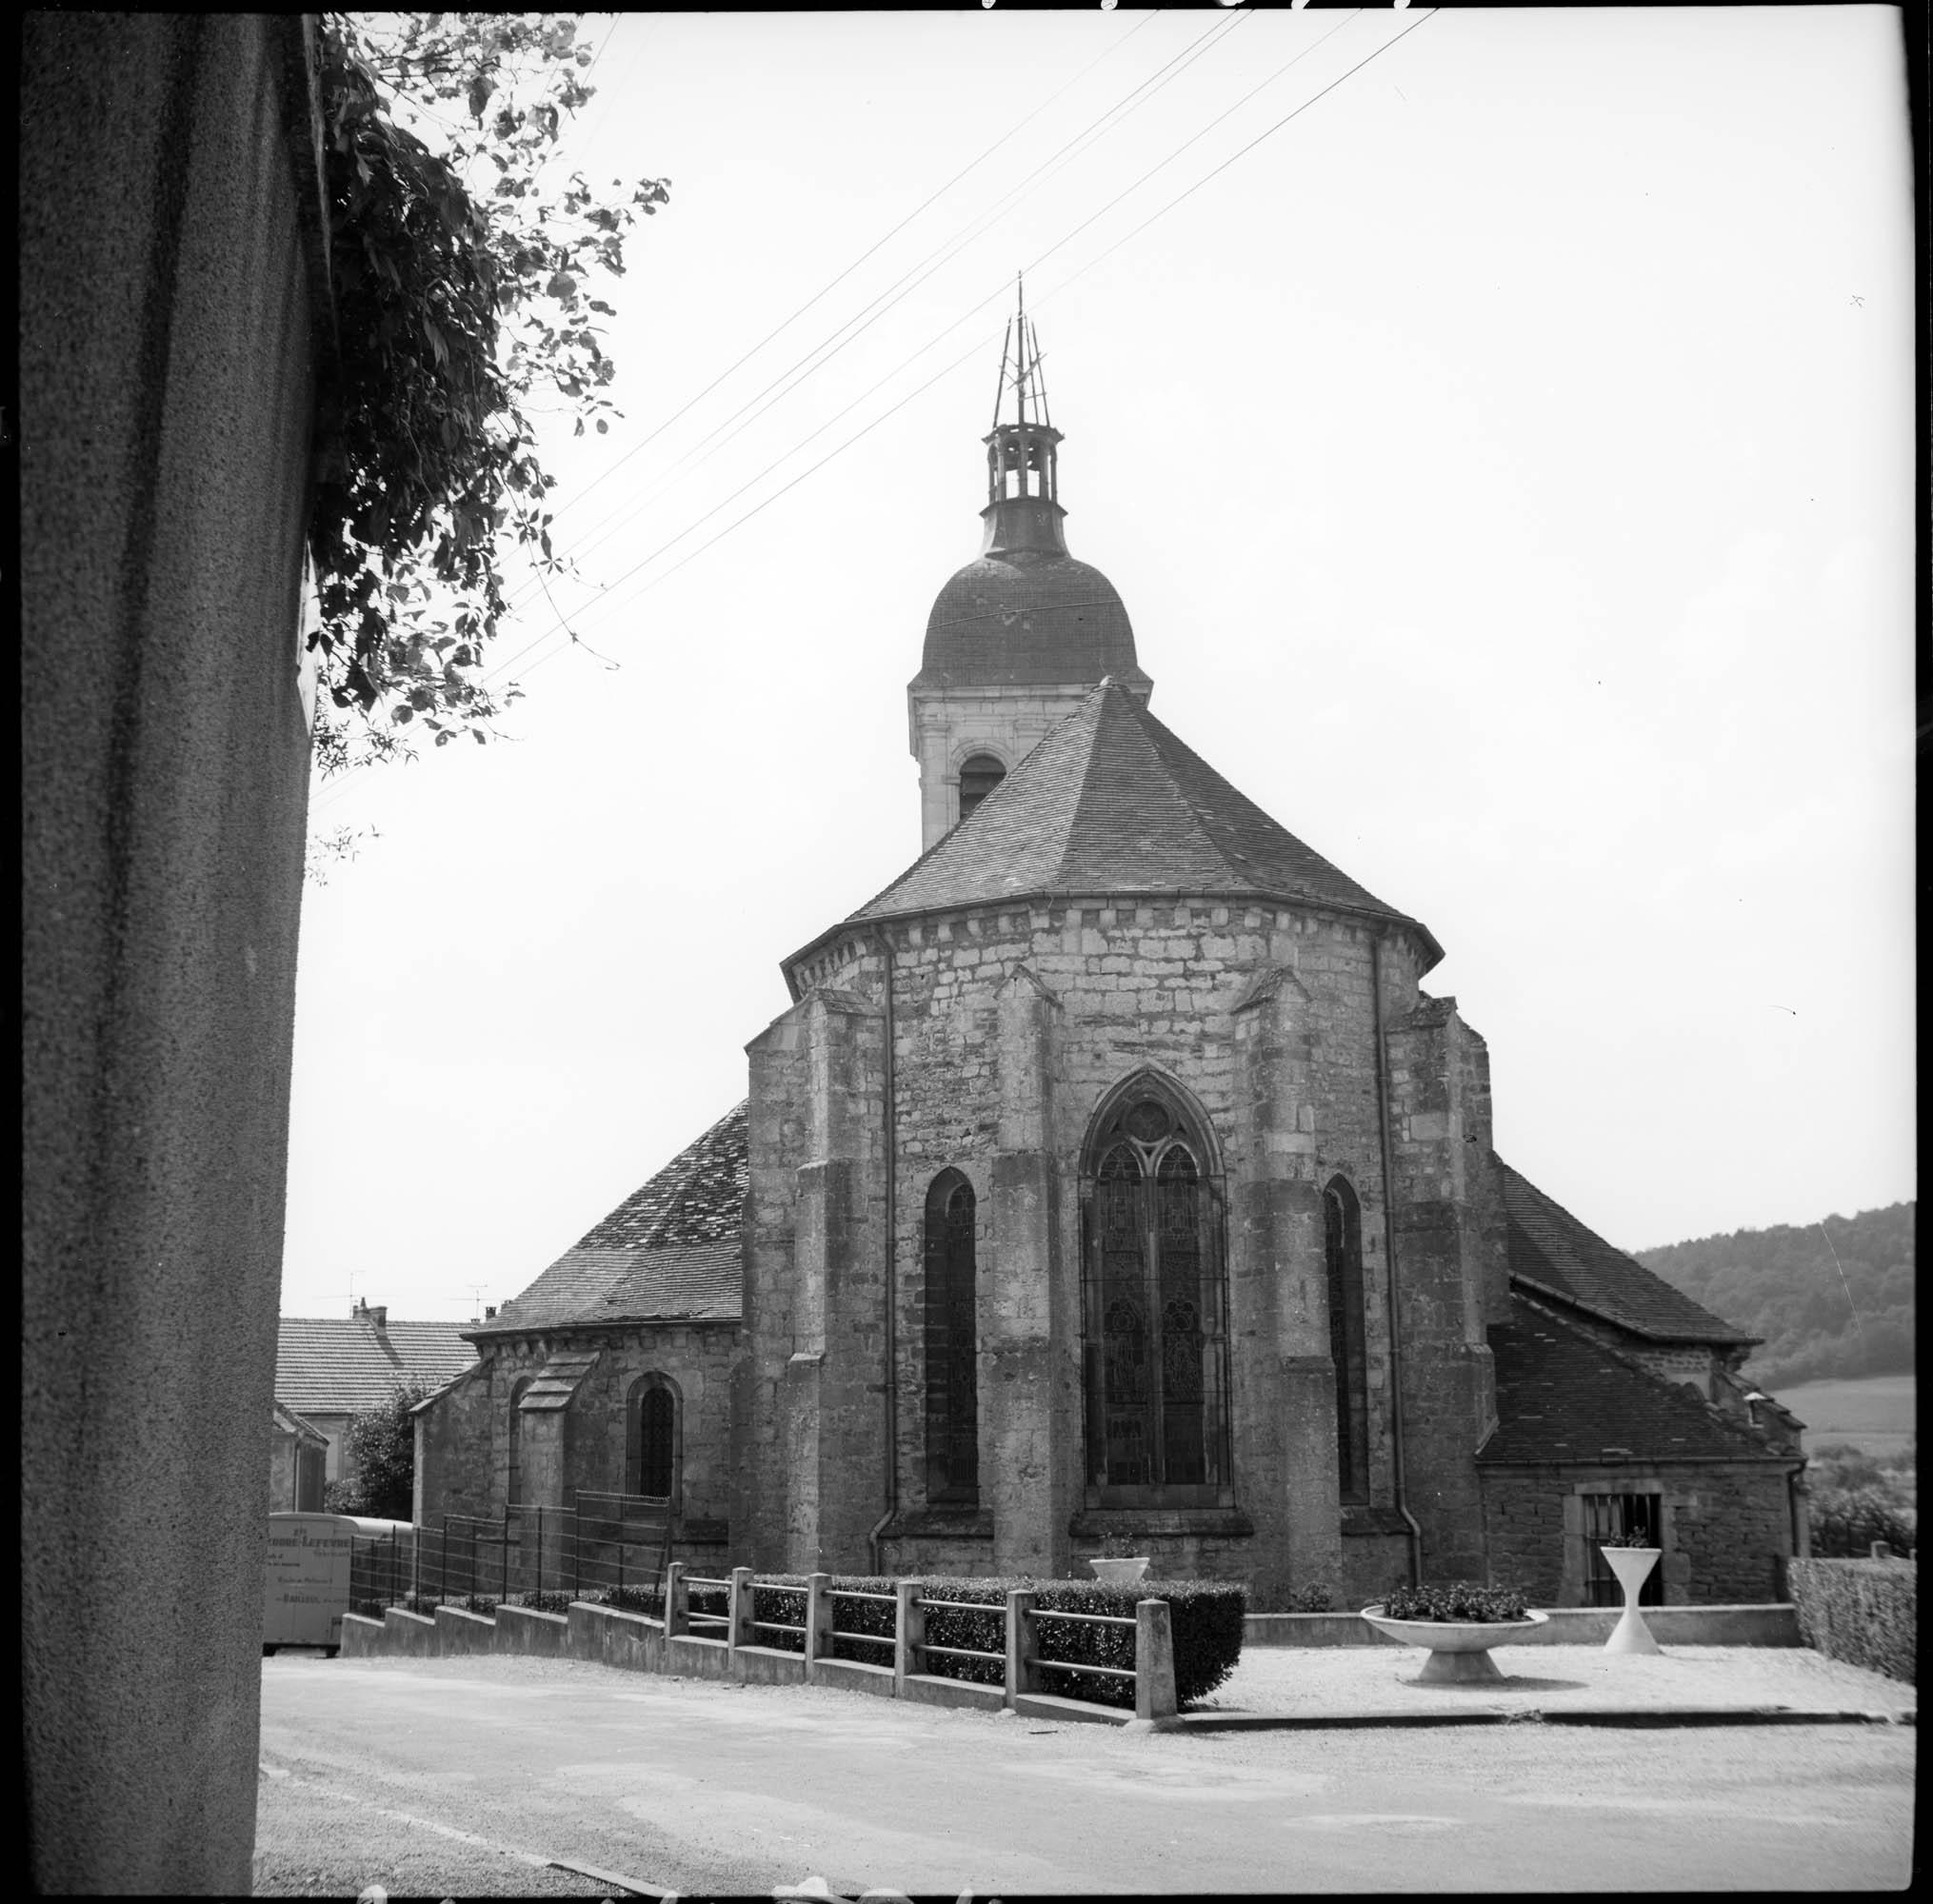 Eglise d'Andelot